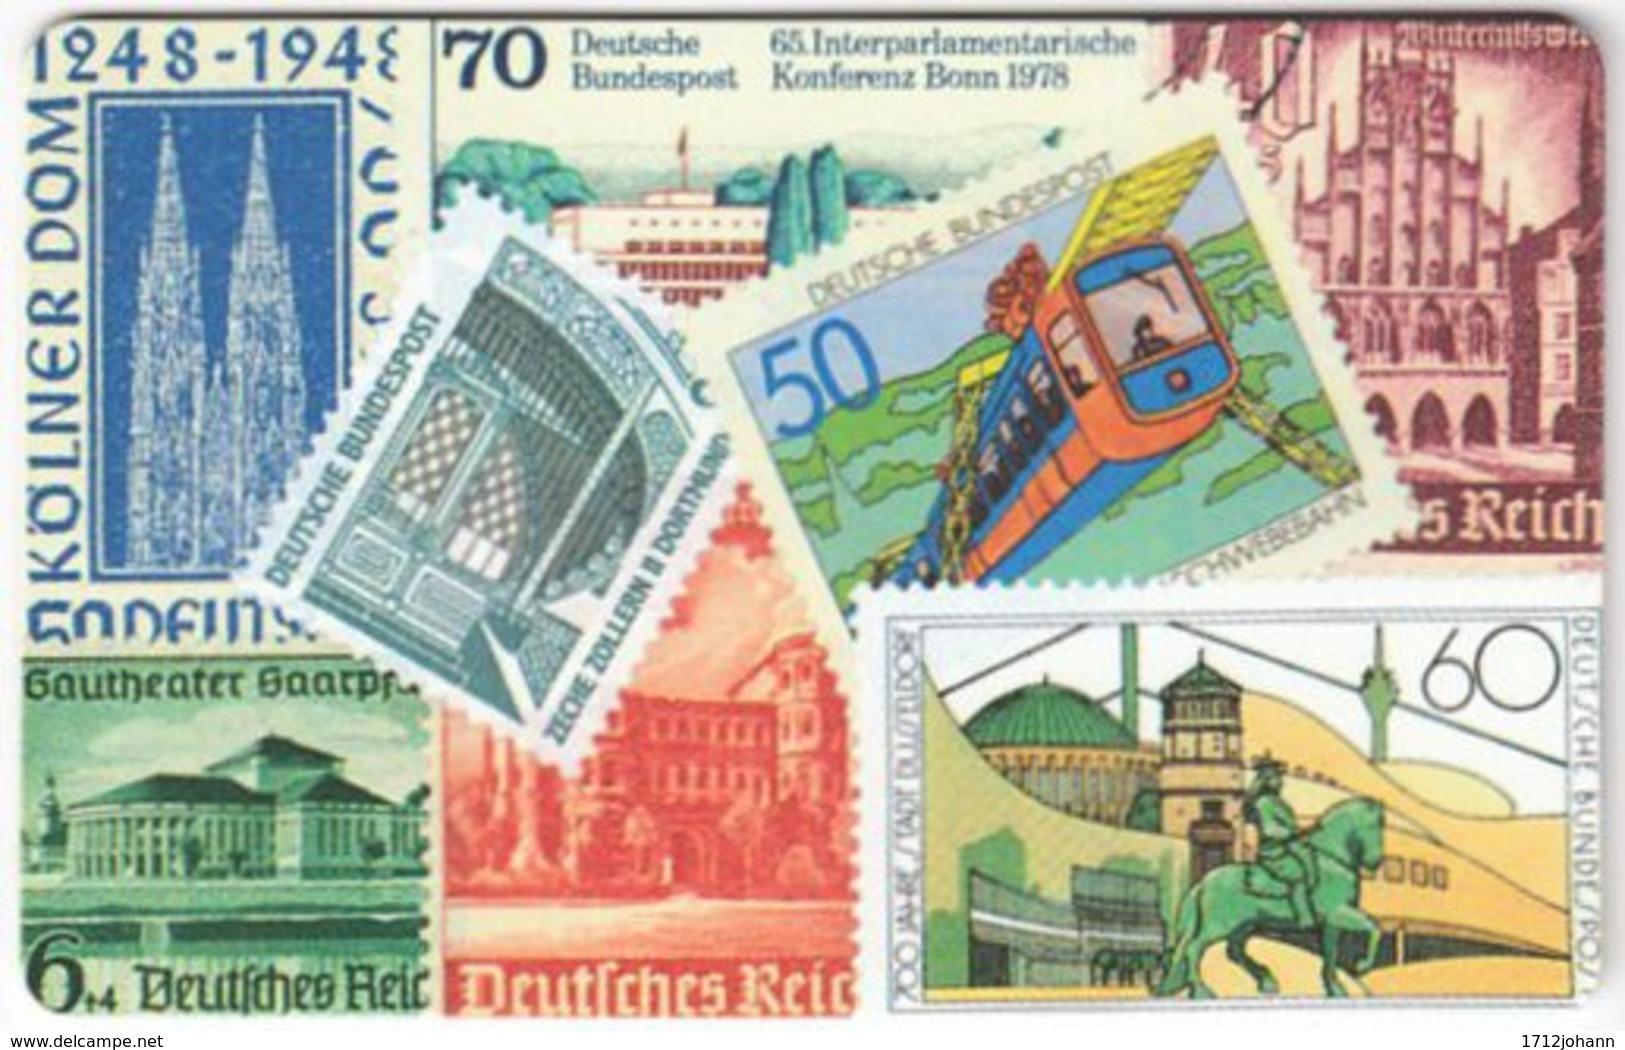 GERMANY O-Serie A-955 - 095 05.92 - Collection, Stamp - MINT - O-Series: Kundenserie Vom Sammlerservice Ausgeschlossen